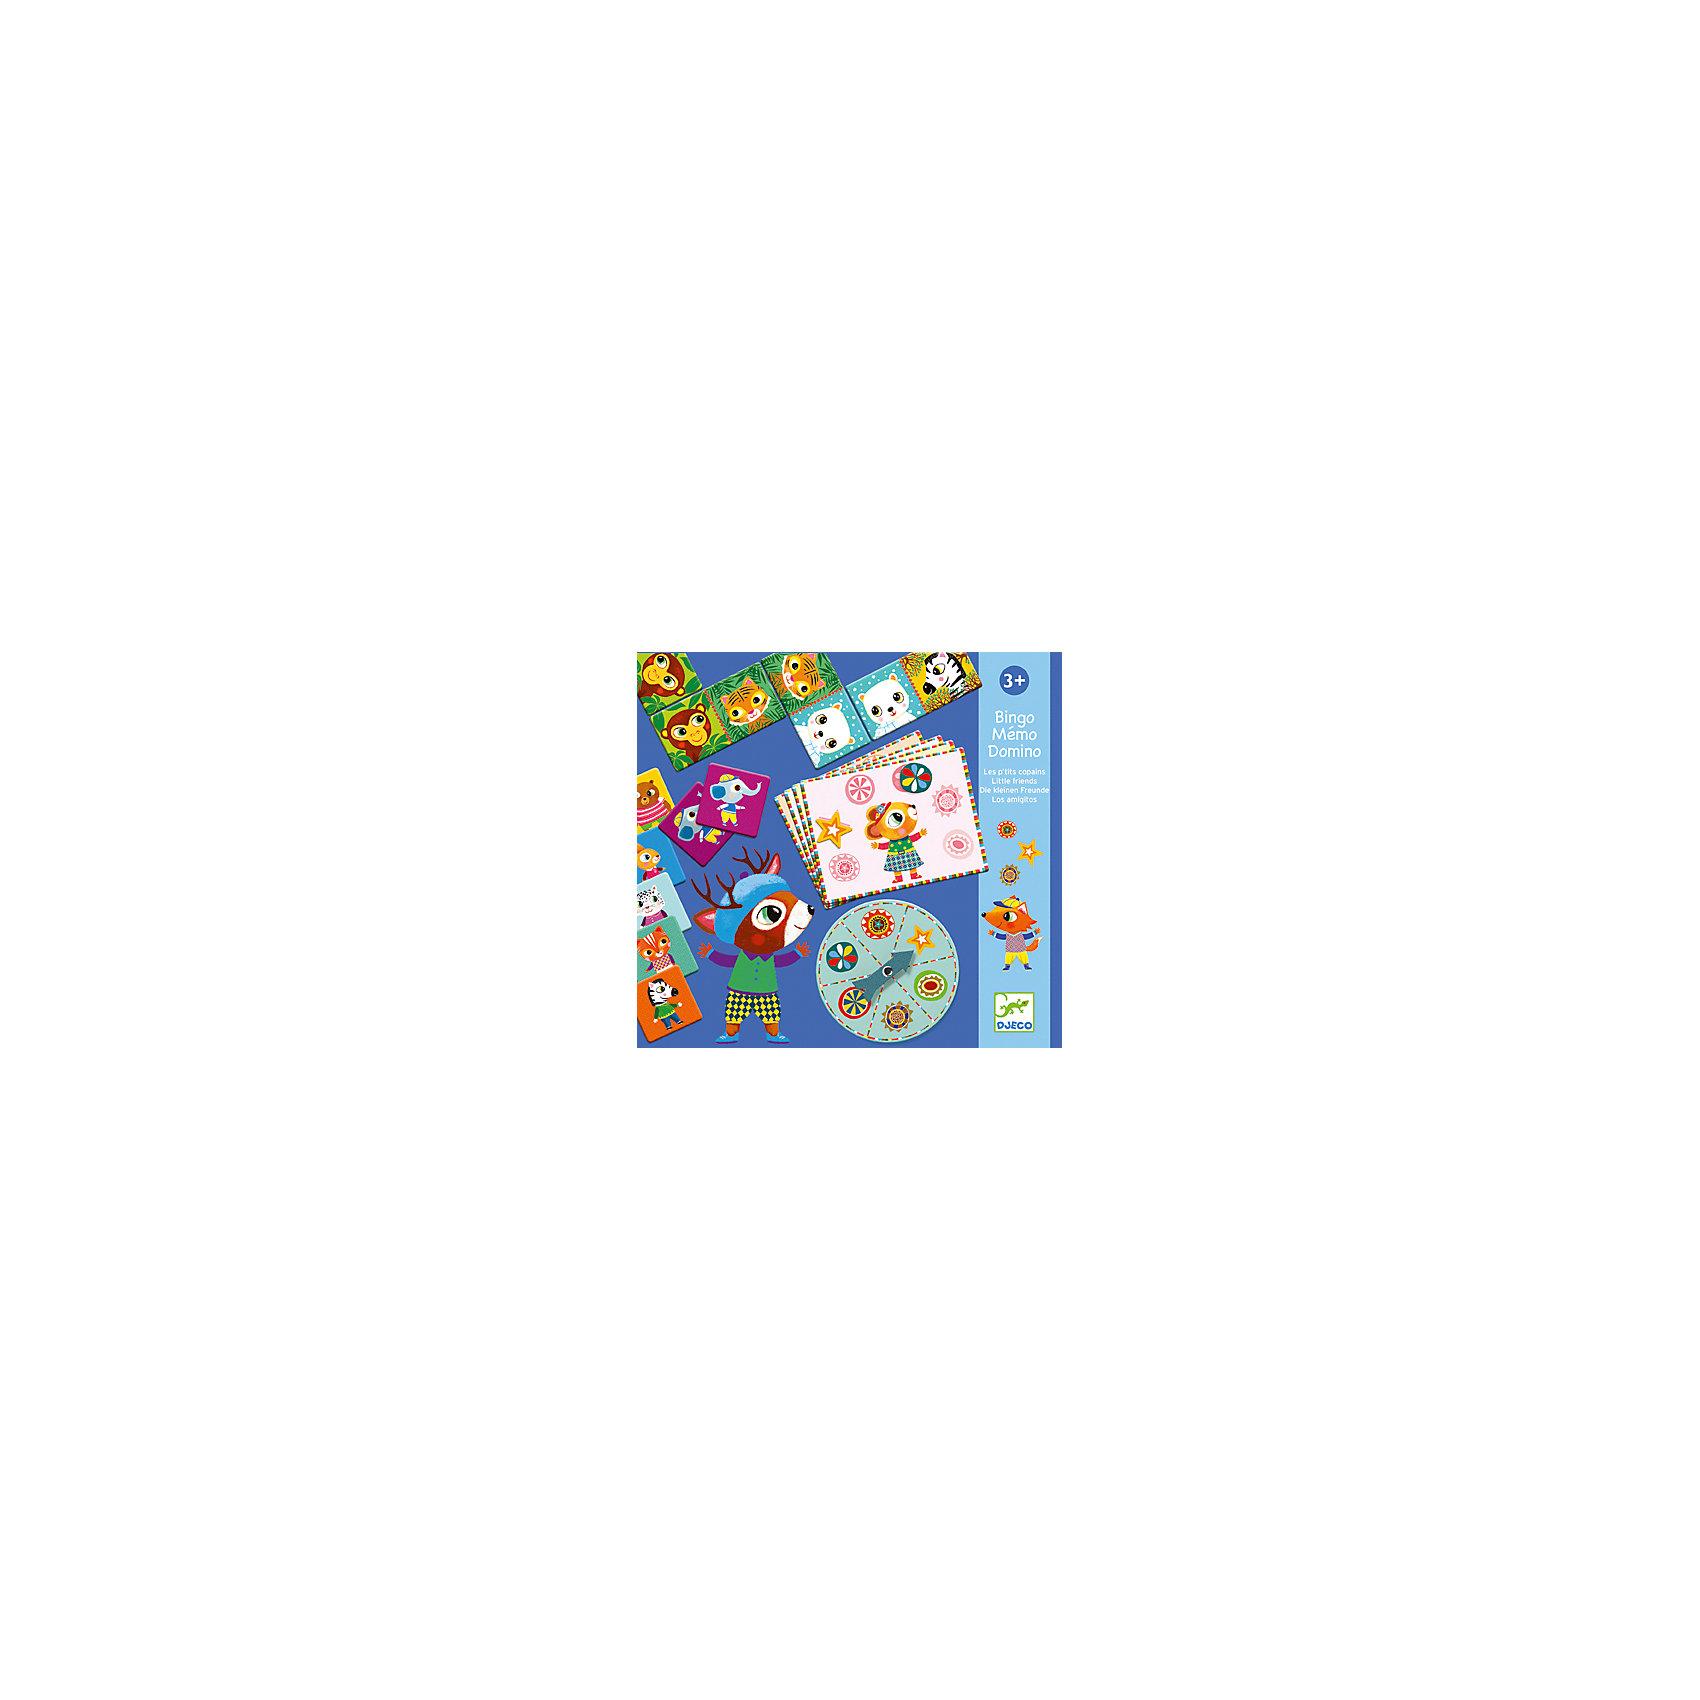 DJECO Набор из 3-ех настольных игр, DJECO набор настольных игр 35700